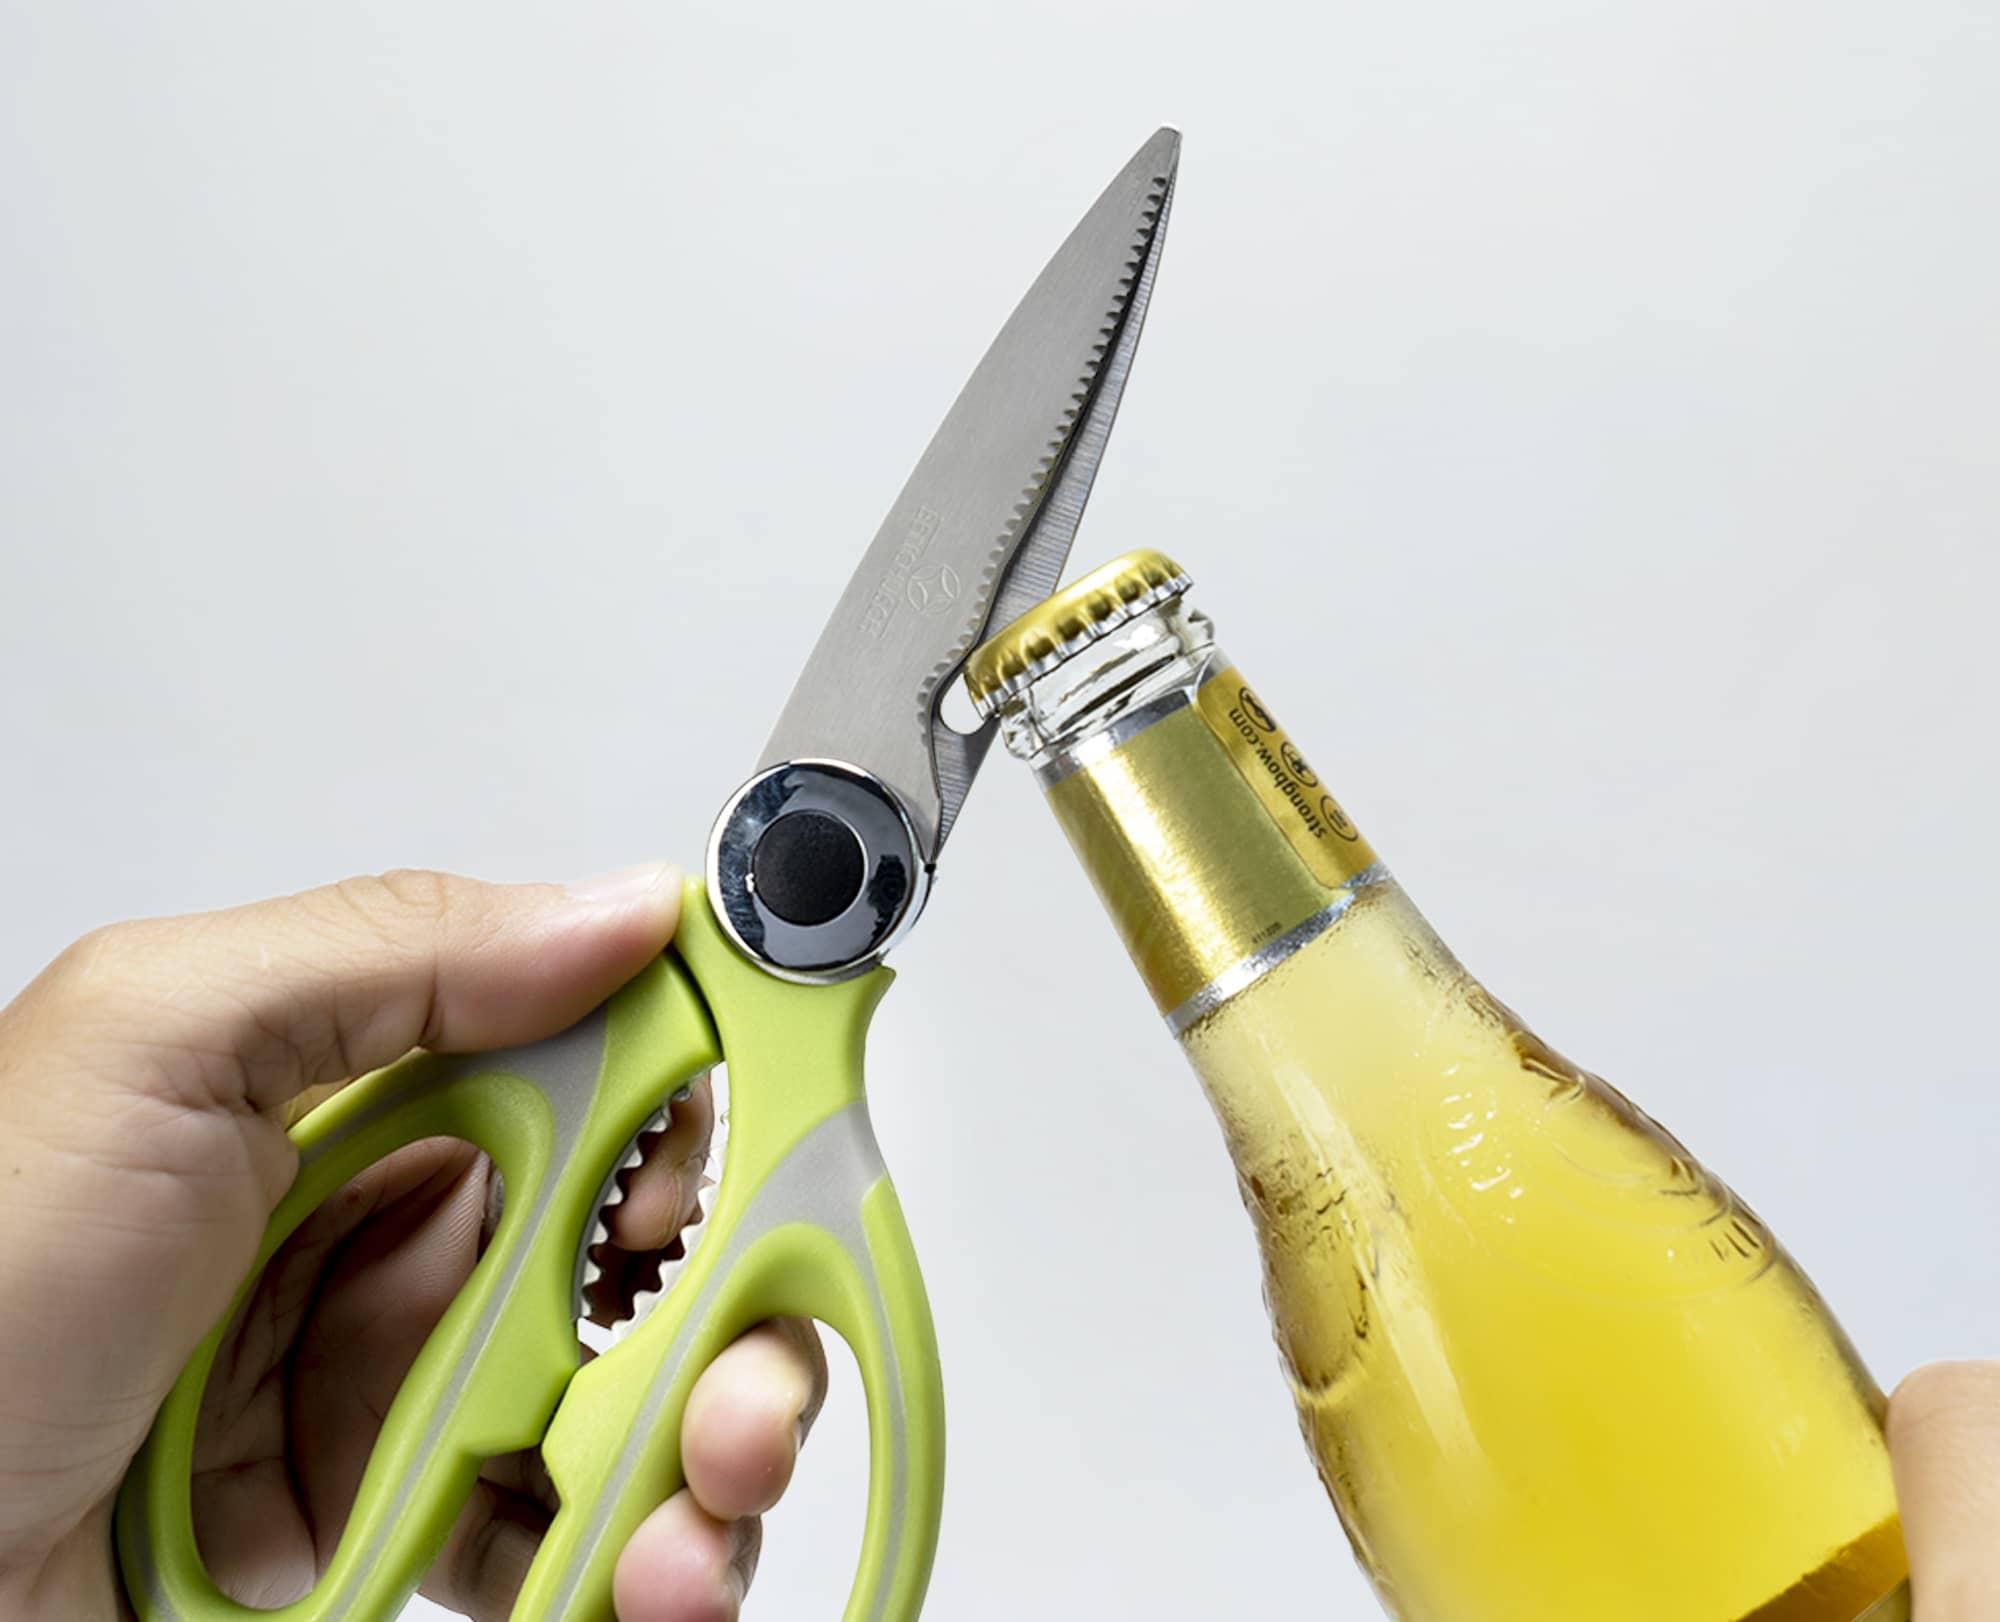 Using Benchusch Multipurpose Kitchen Shears to open the bottle